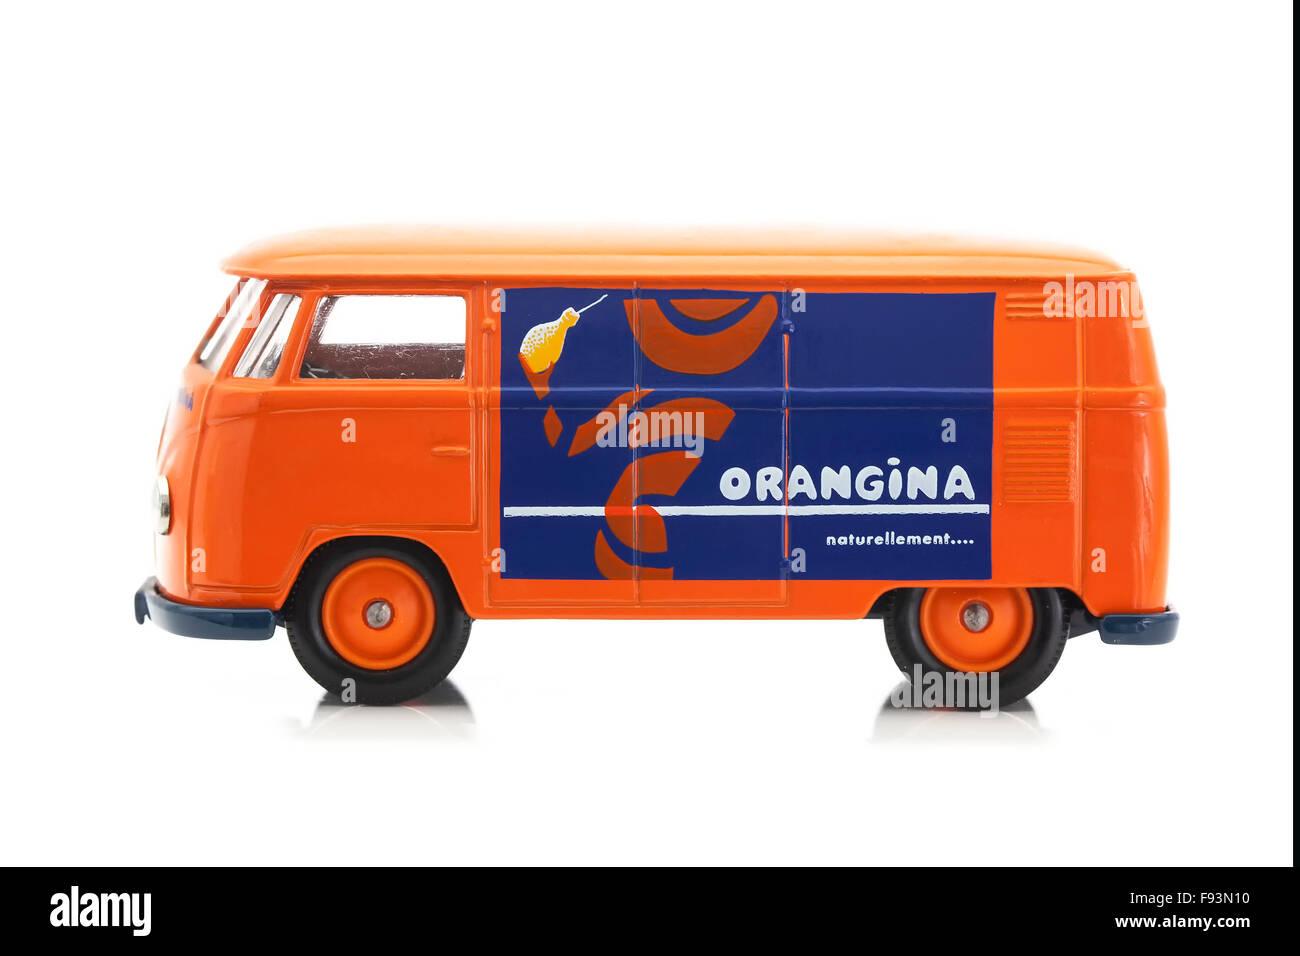 Old VW Van with Orangina Logo on a White Background - Stock Image